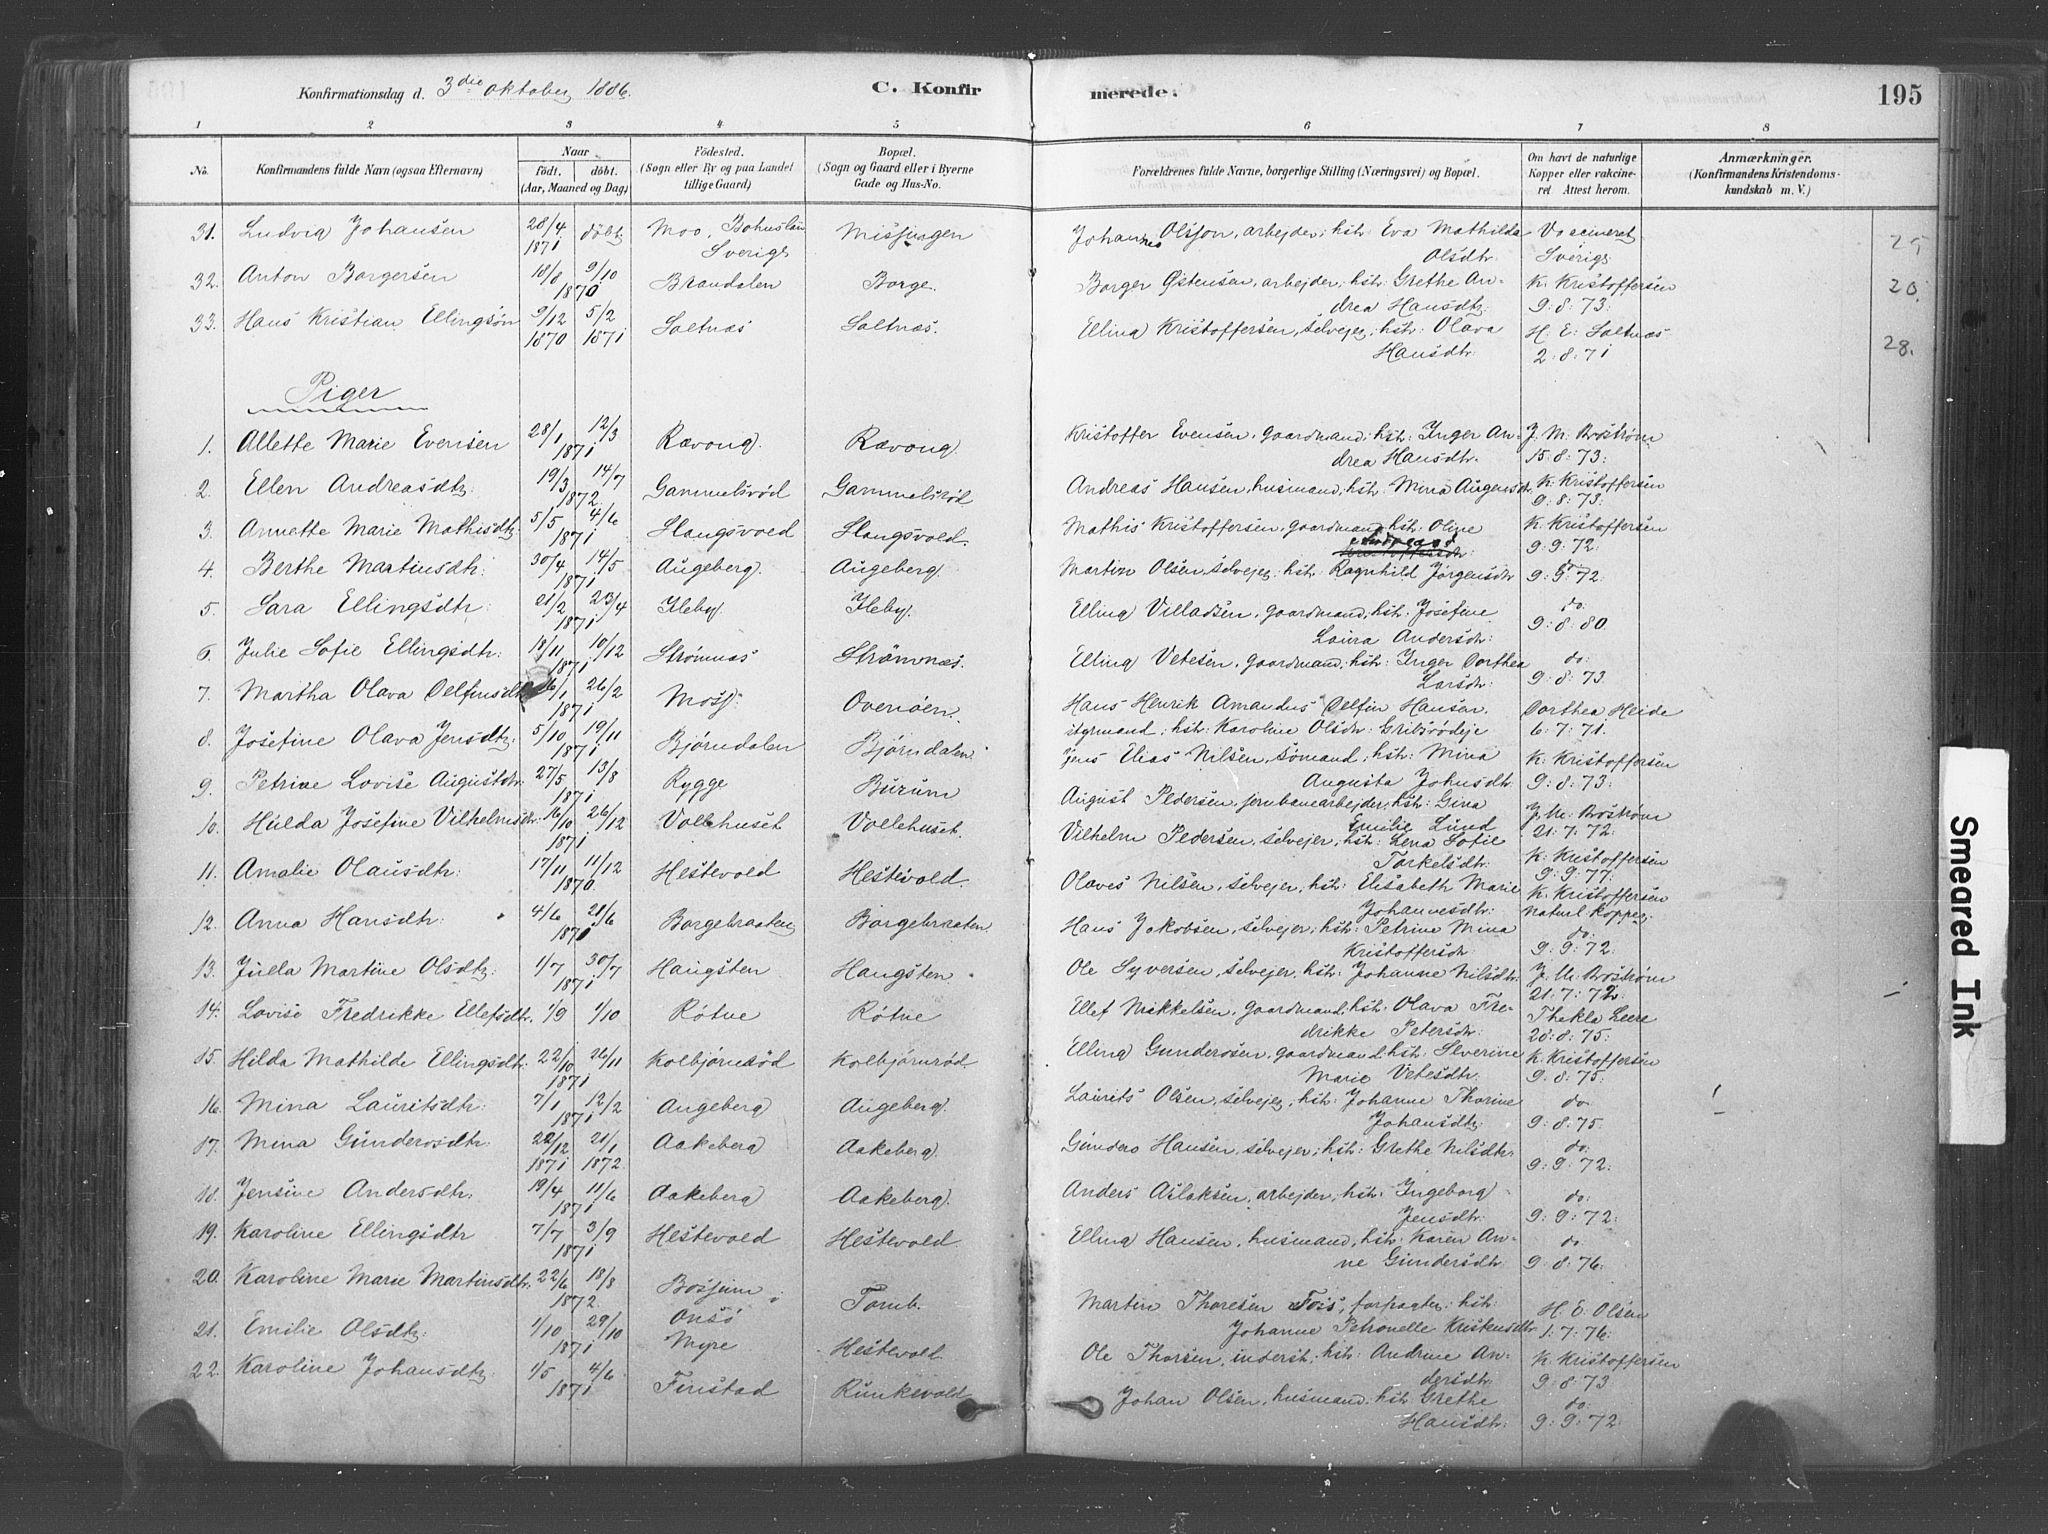 SAO, Råde prestekontor kirkebøker, F/Fa/L0007: Ministerialbok nr. 7, 1878-1902, s. 195